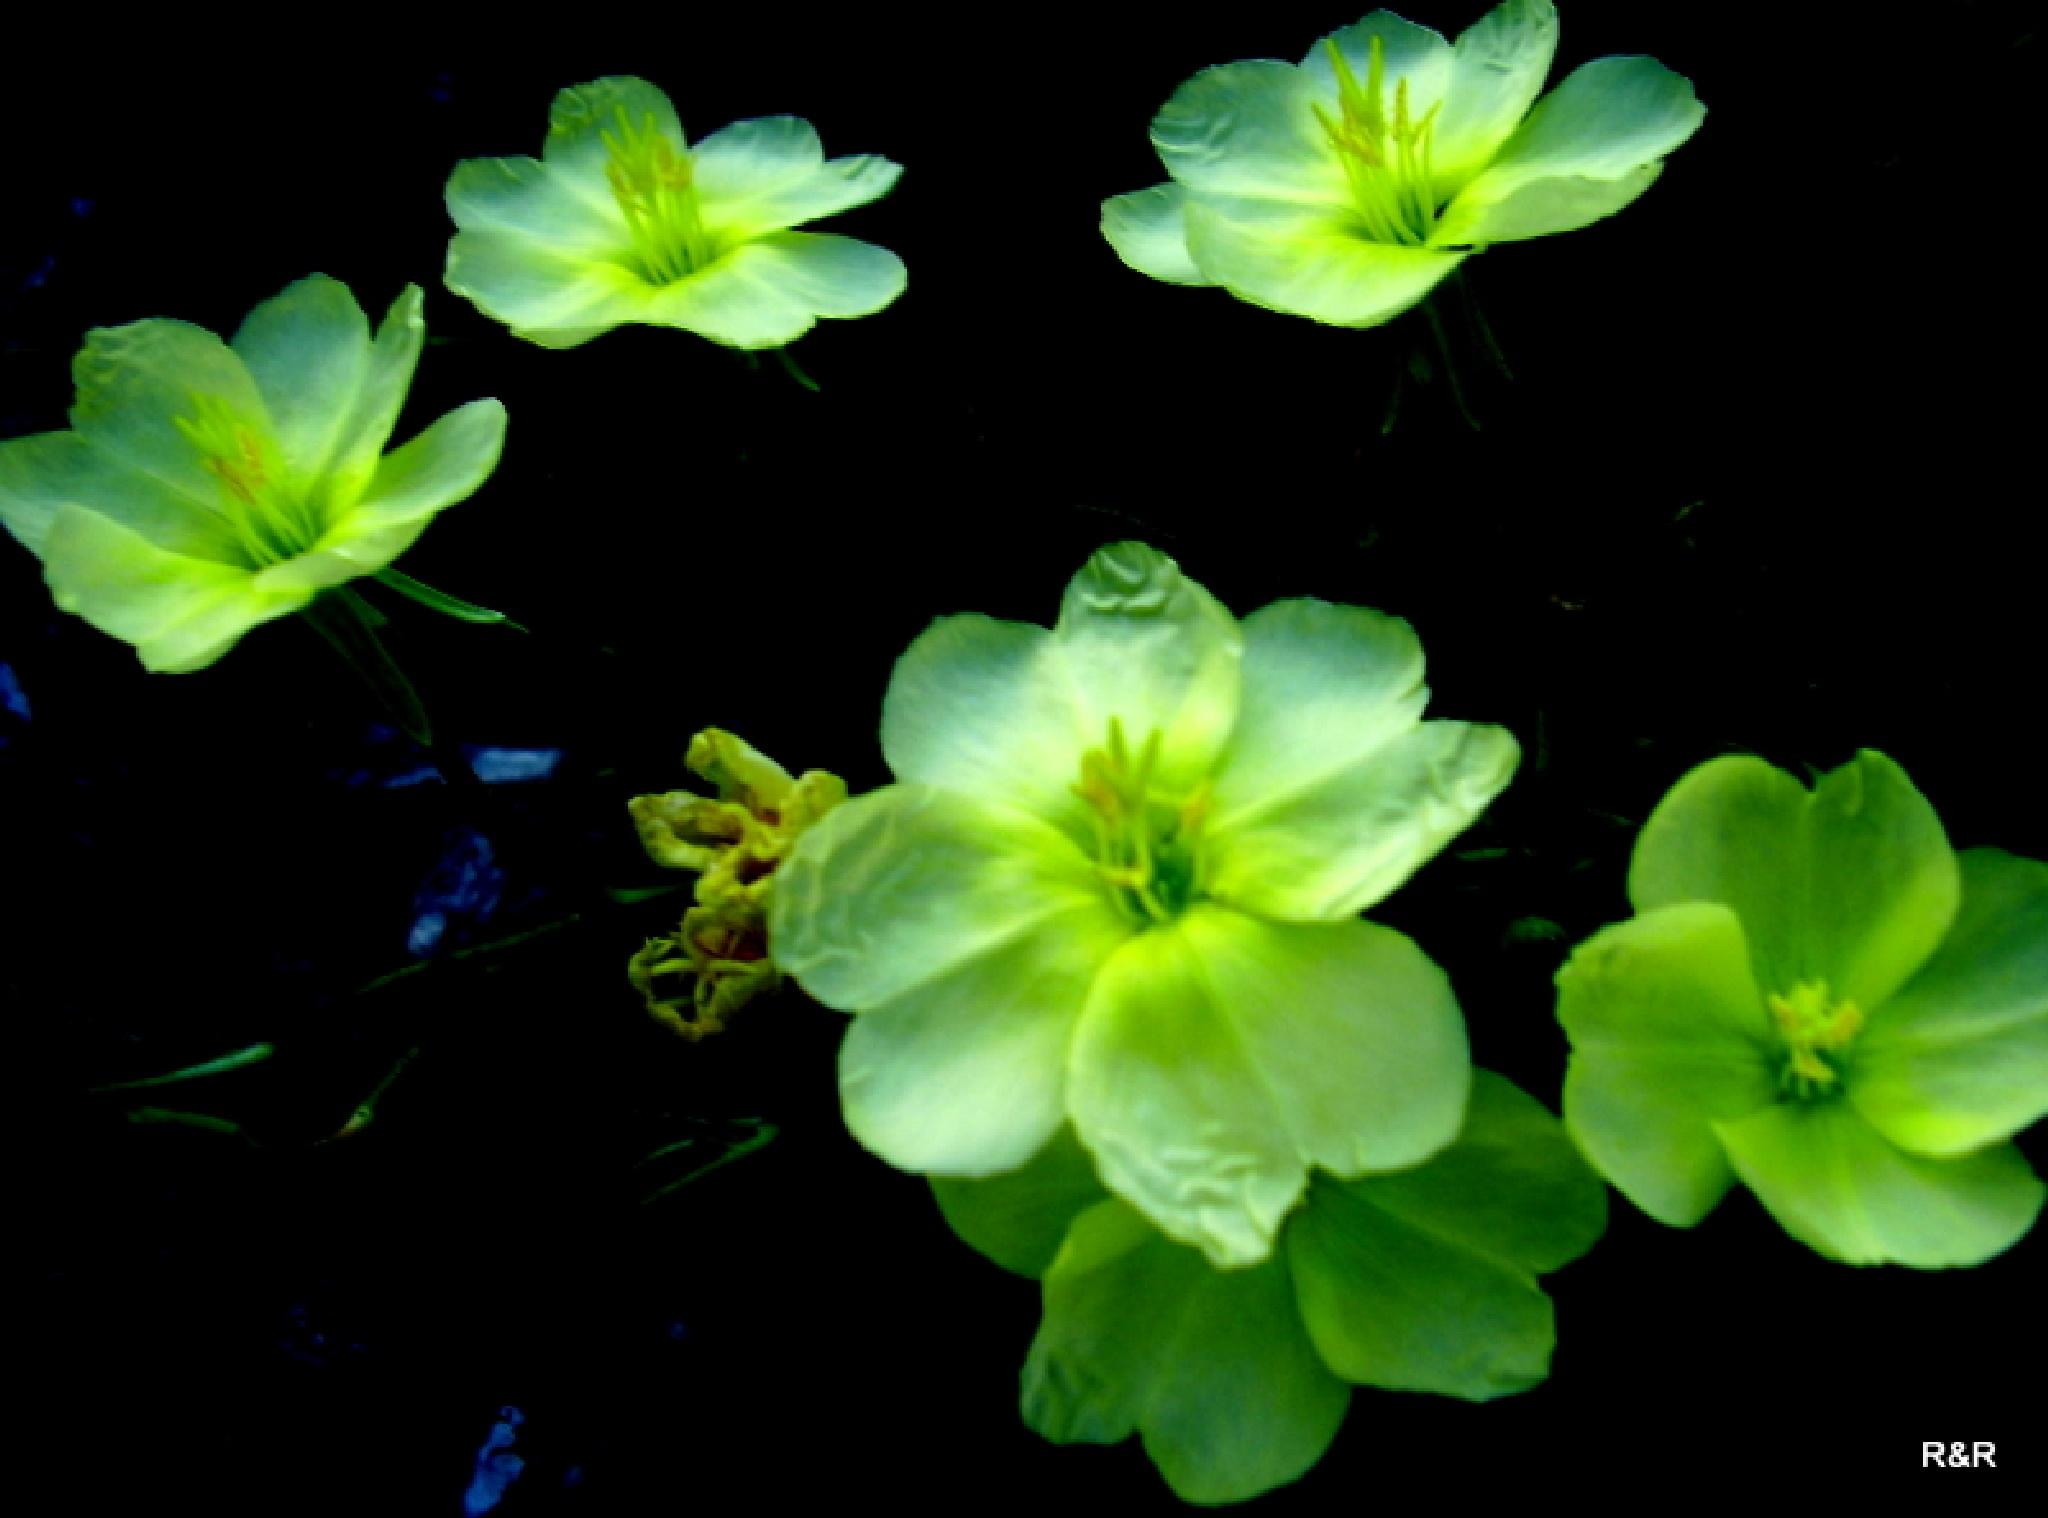 Moonlight Flowers by lana.cezzar